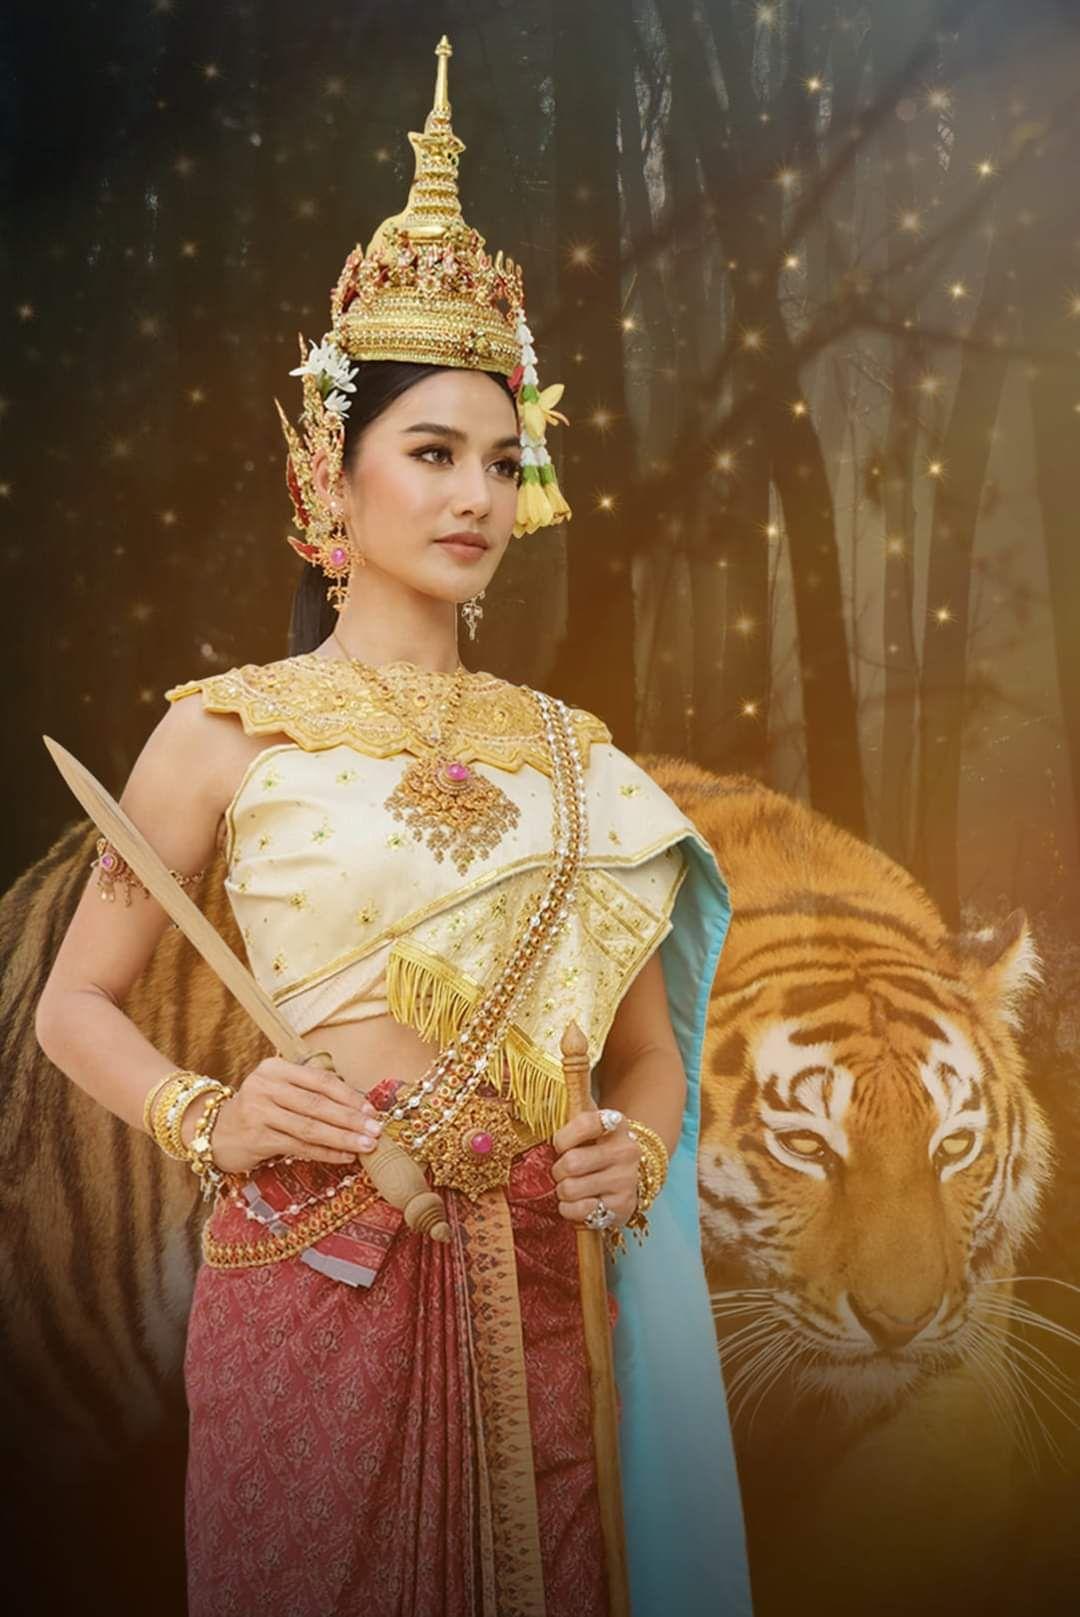 Koraka Devi goddess Songkran, Thailand 2020 ในปี 2020